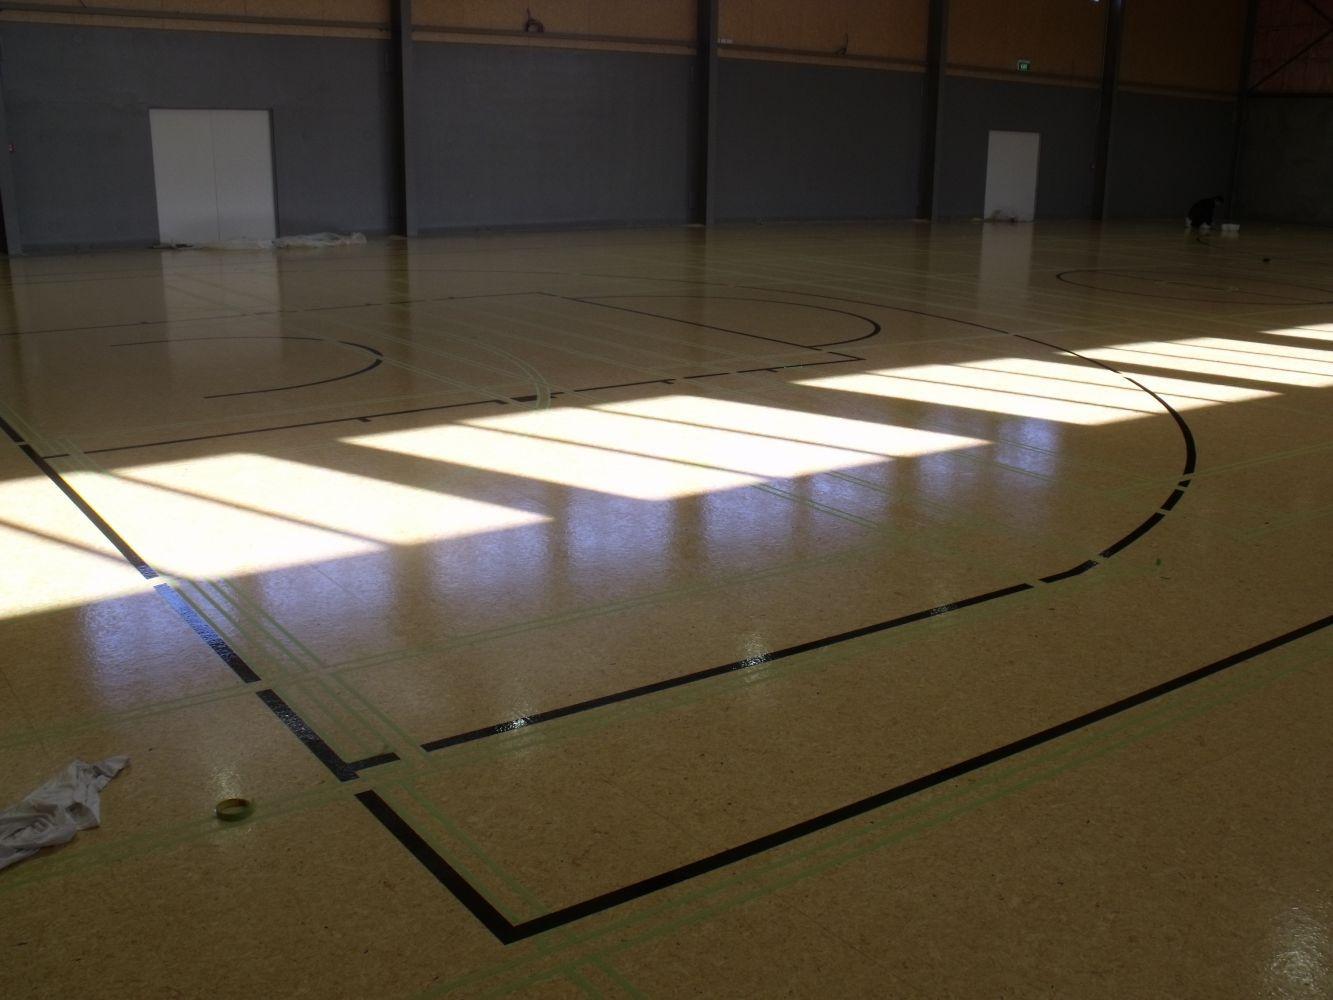 Basketball line marking